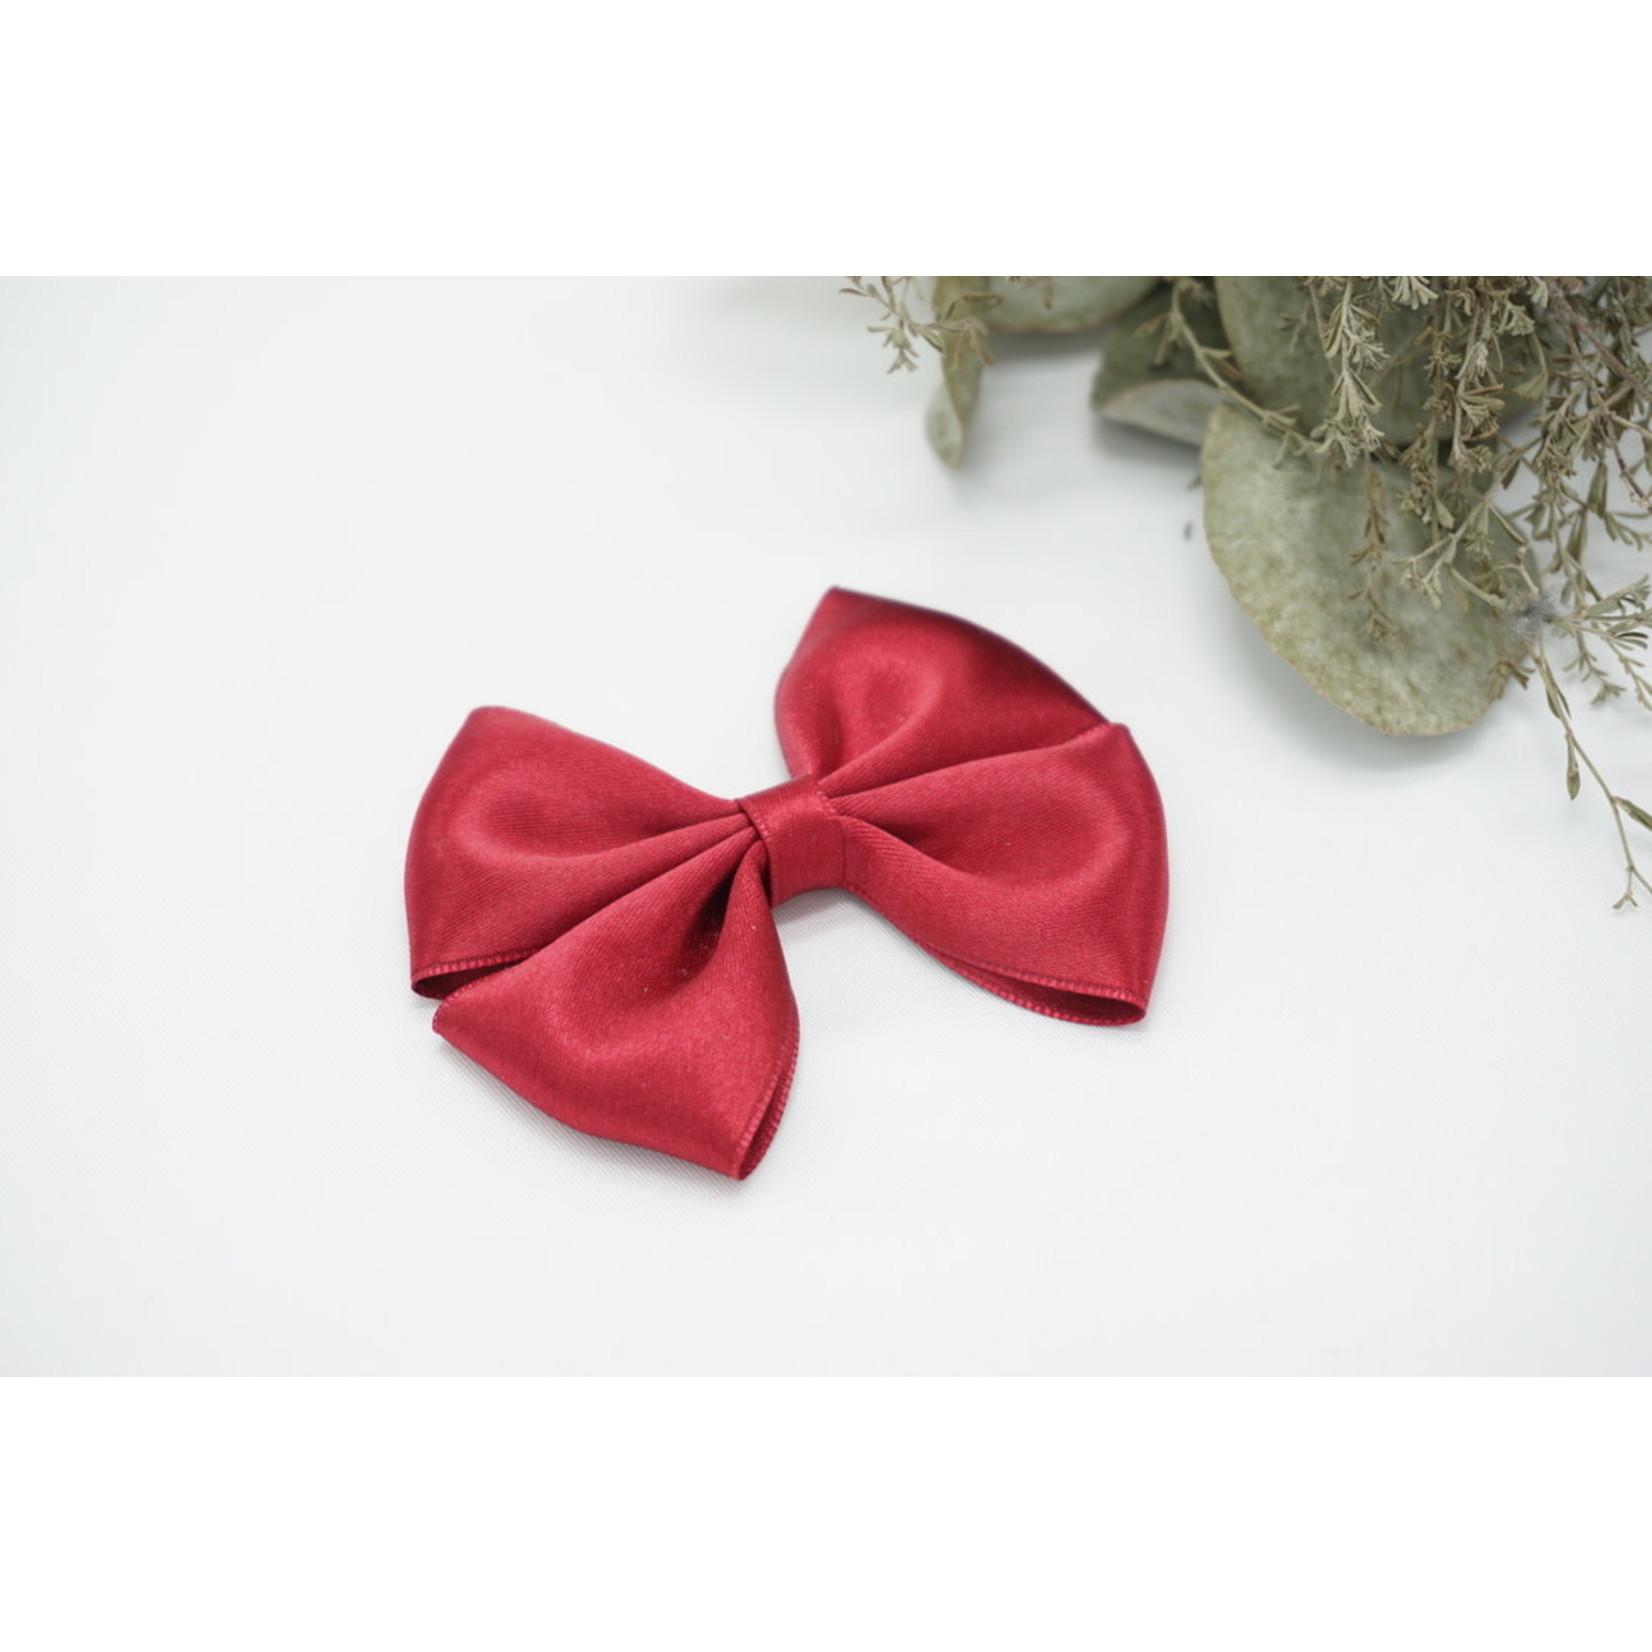 Petite Zara Satin Bow - Garnet